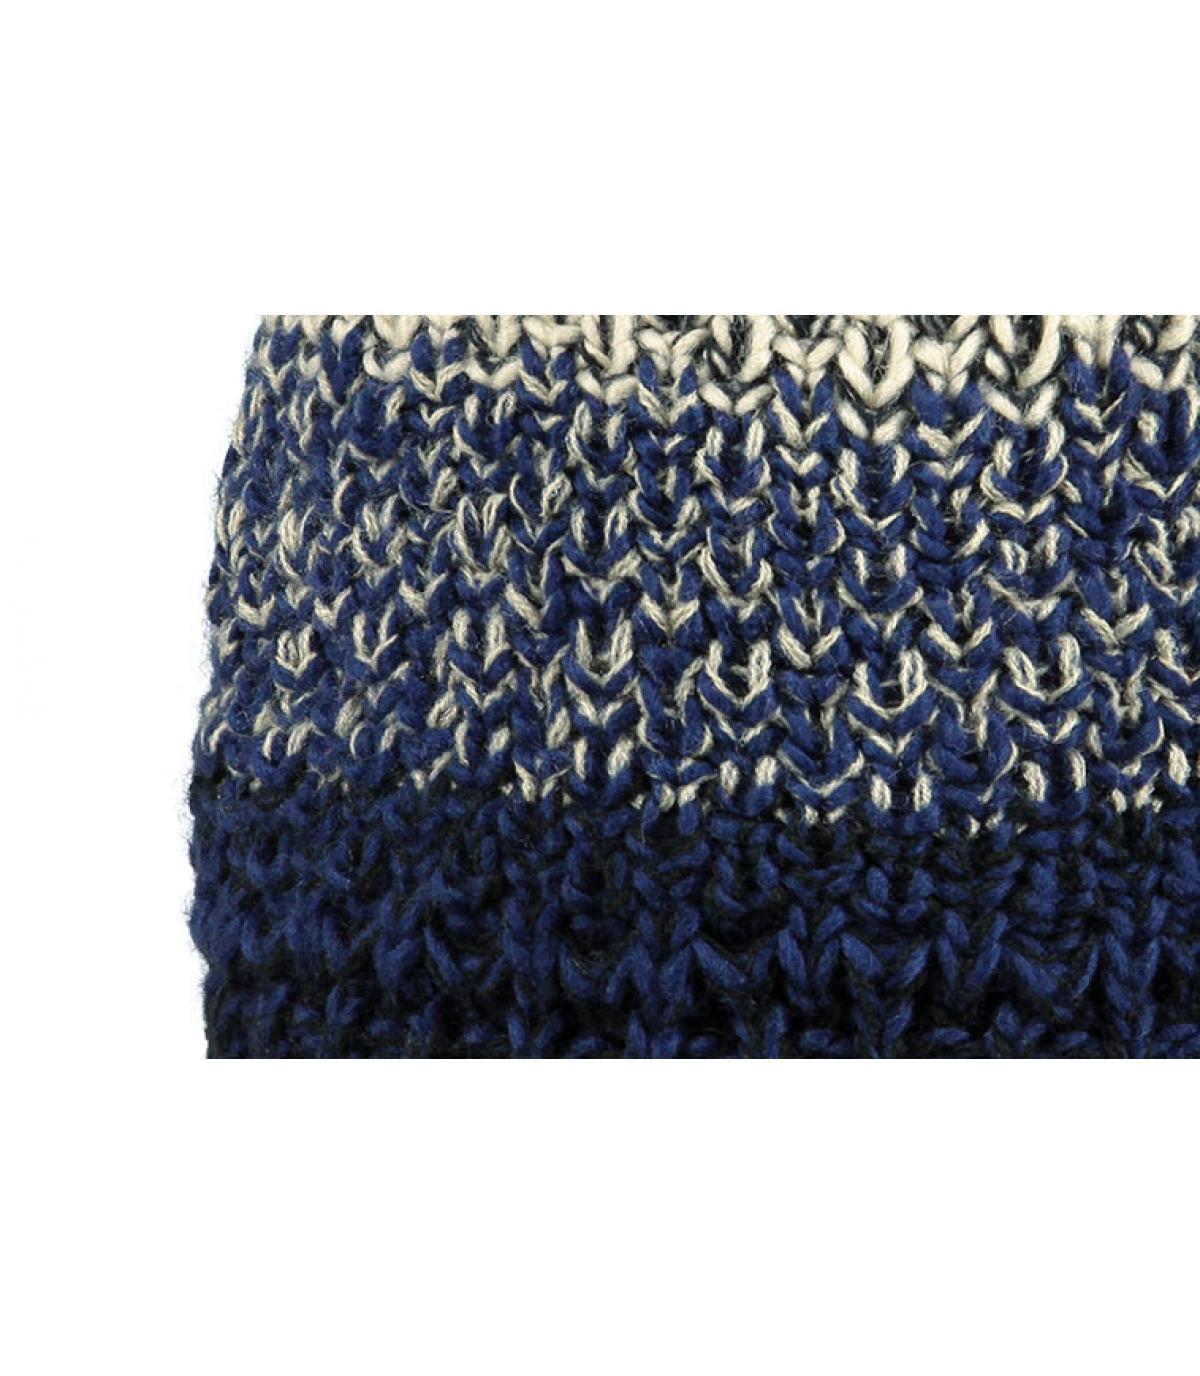 ee772aebfbbd Gorro Lester dark azule